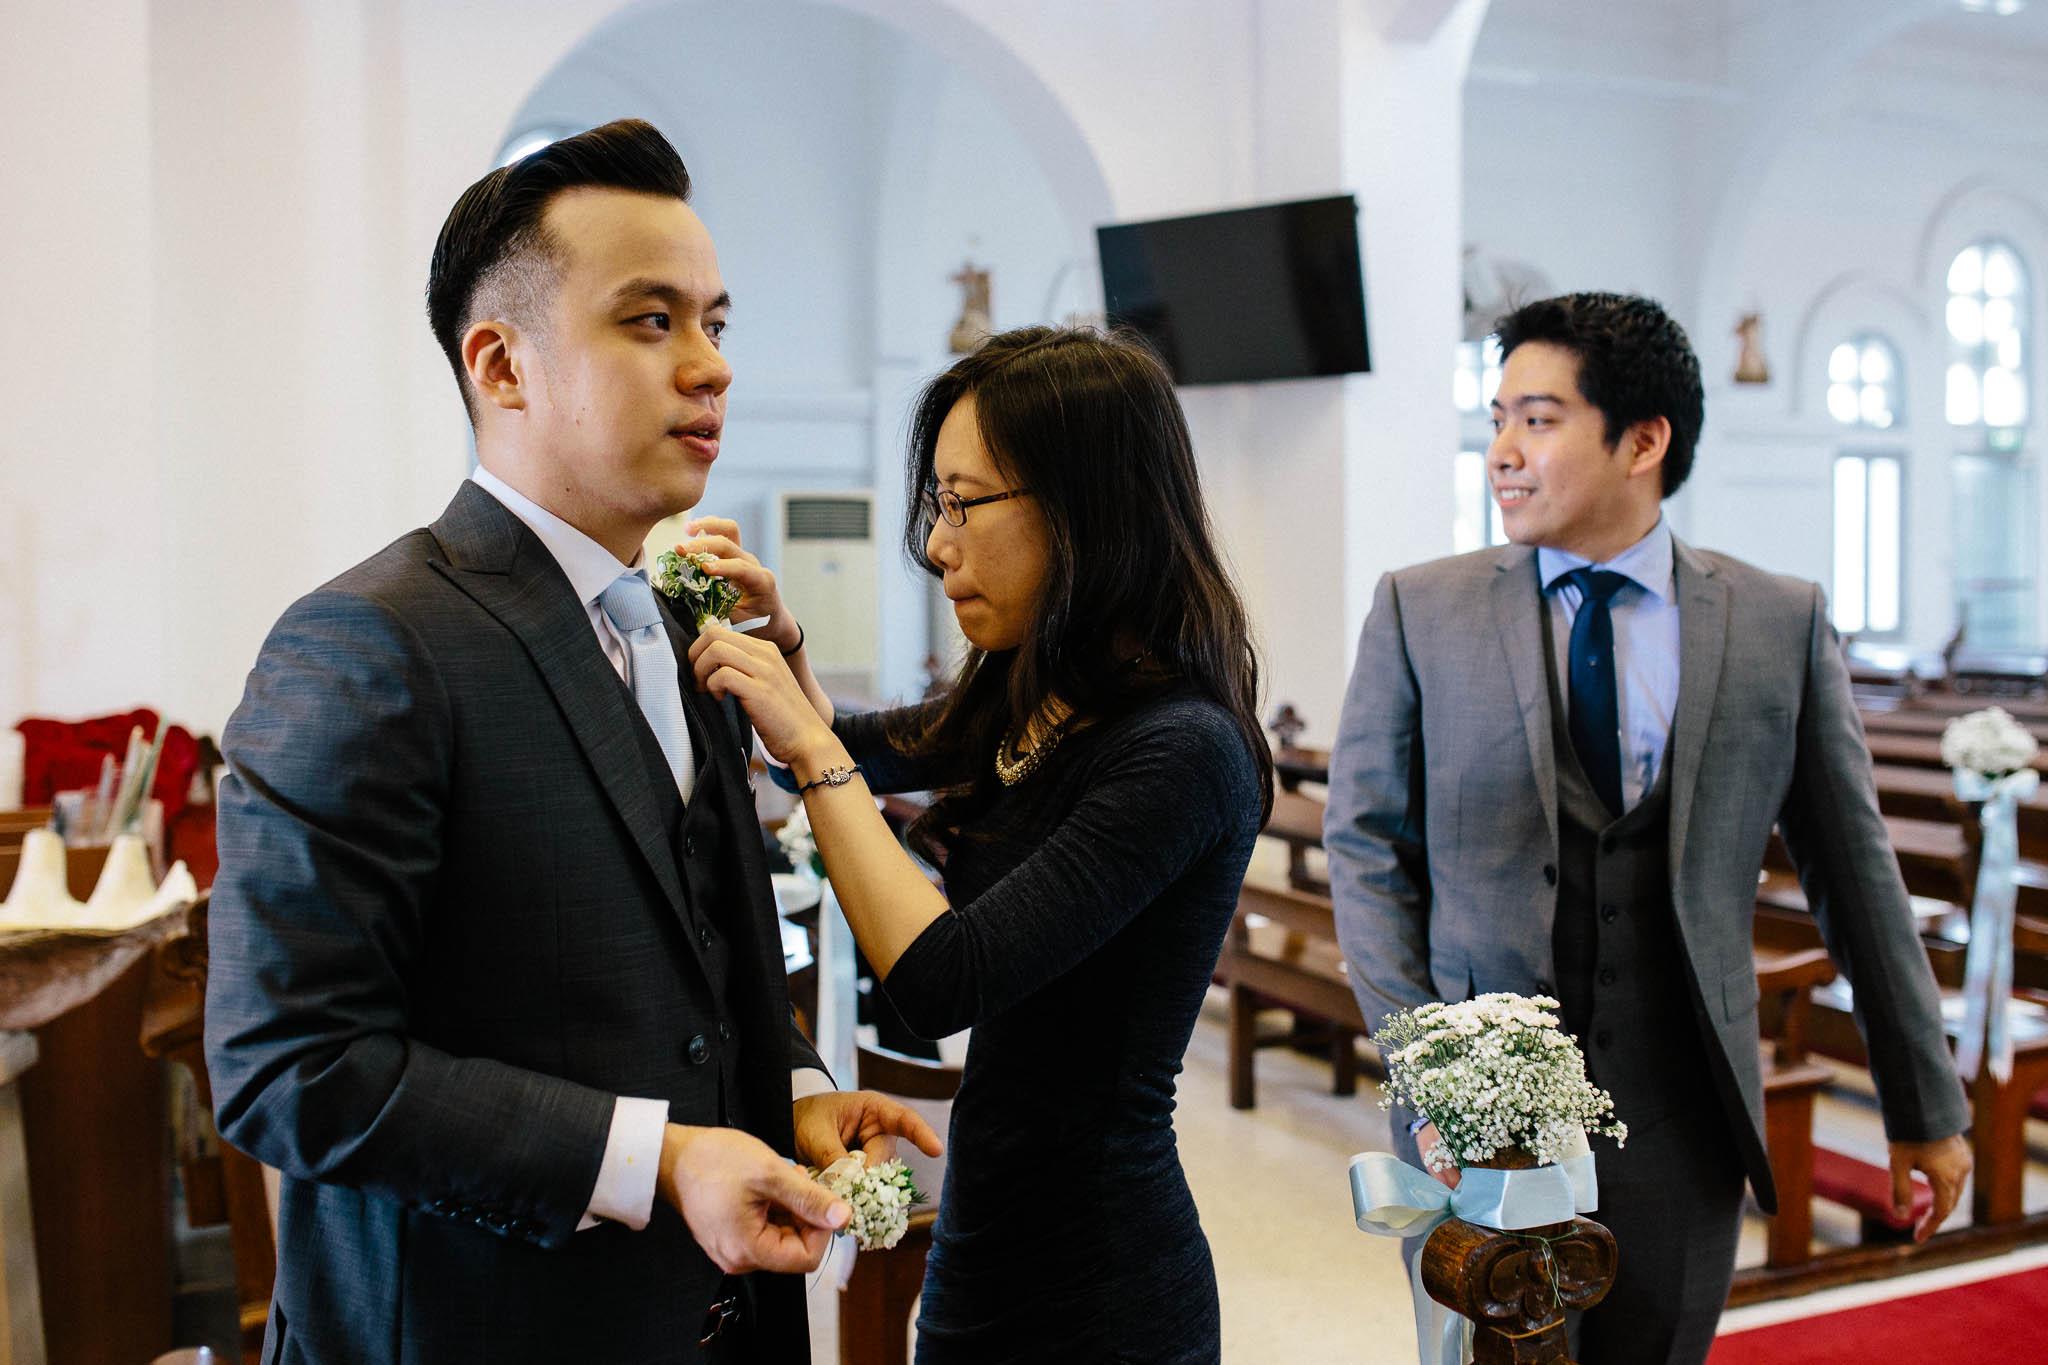 singapore-wedding-photographer-malay-indian-pre-wedding-travel-wmt-2015-jeremy-larissa-18.jpg